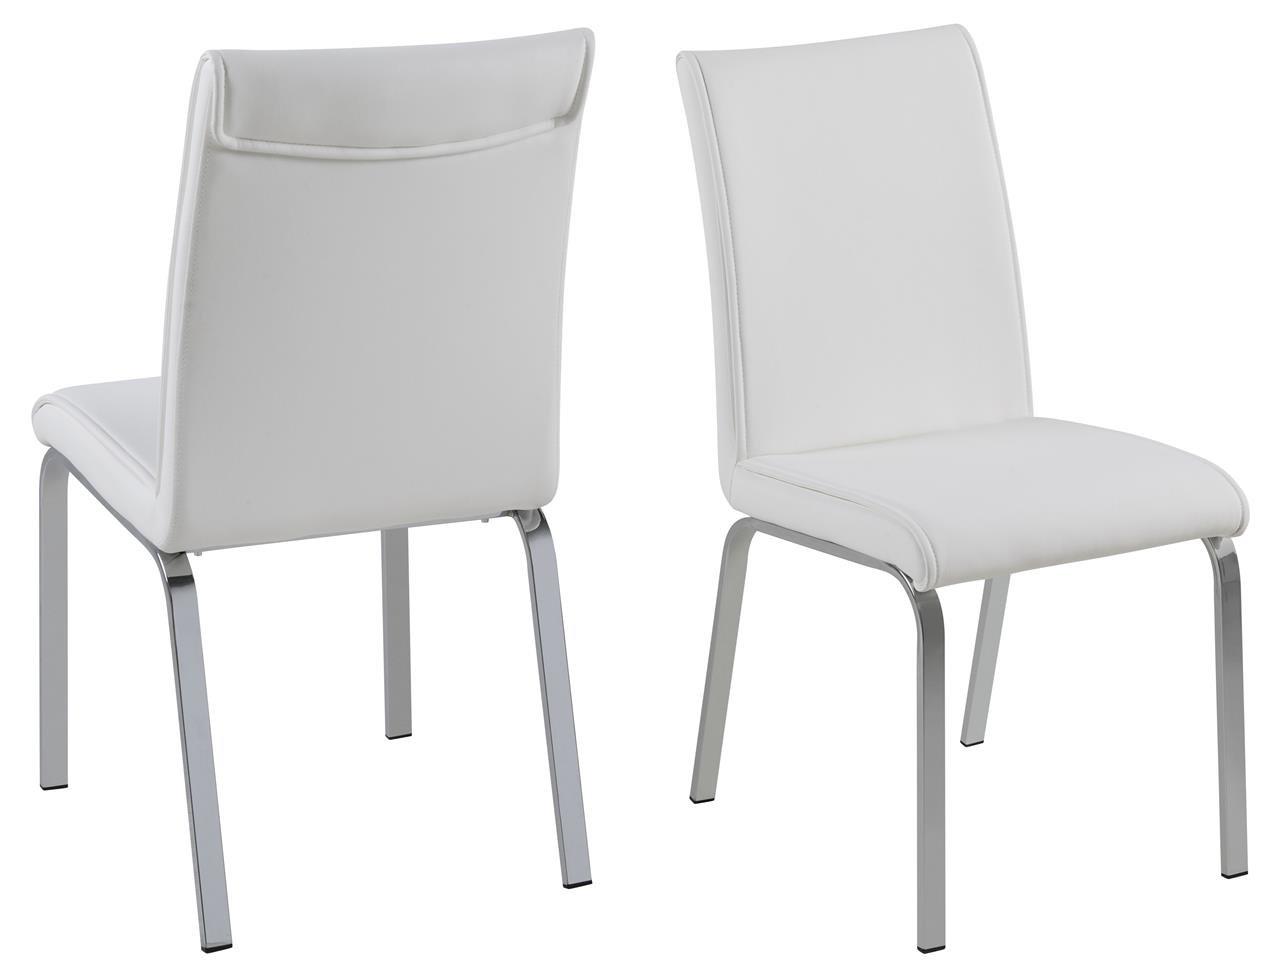 12 X Esszimmerstuhl Kunstleder Mit Chromgestell Moderner Stuhl